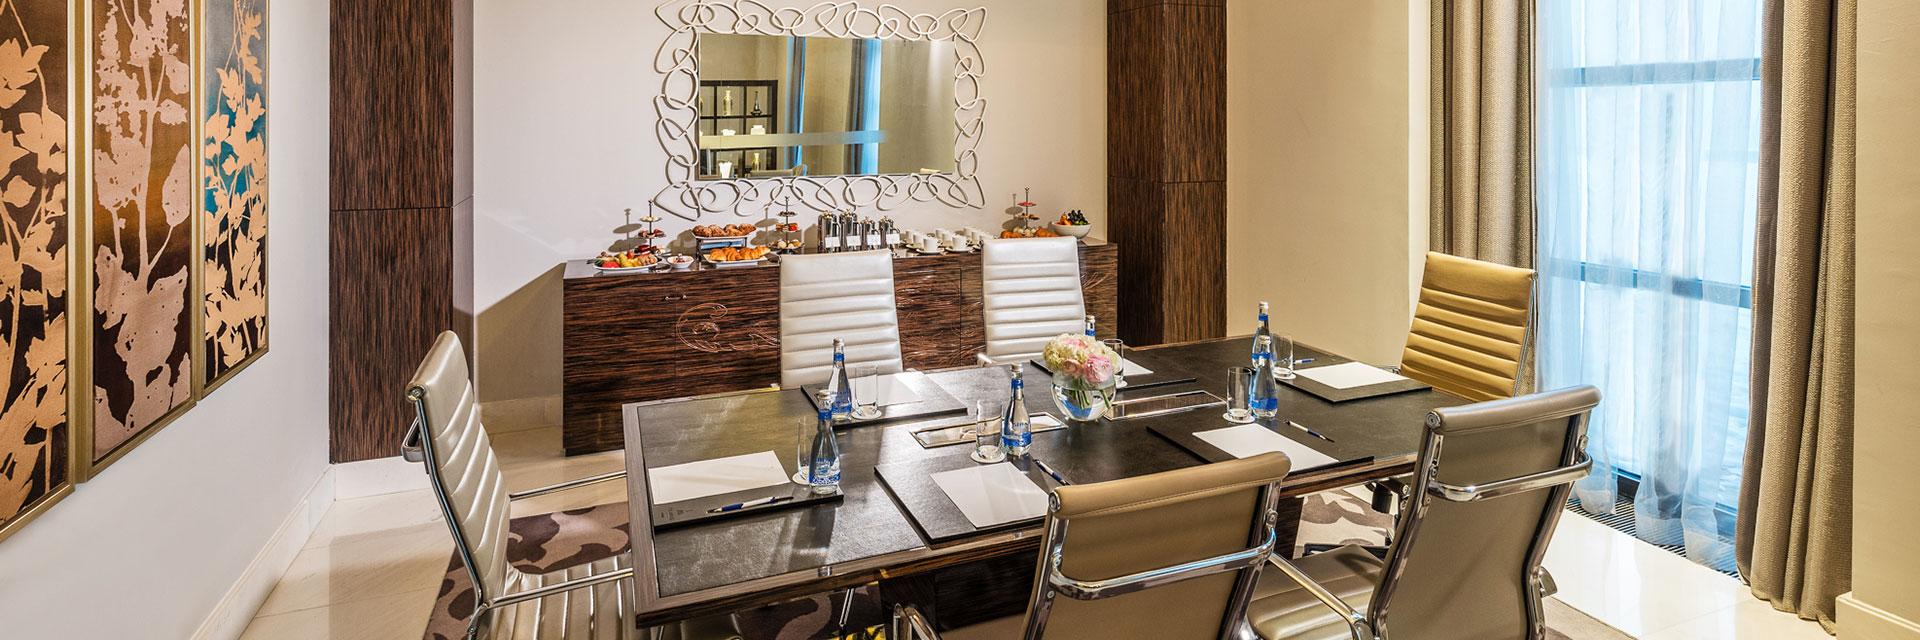 Meetings at Hotel Azerbaijan Top